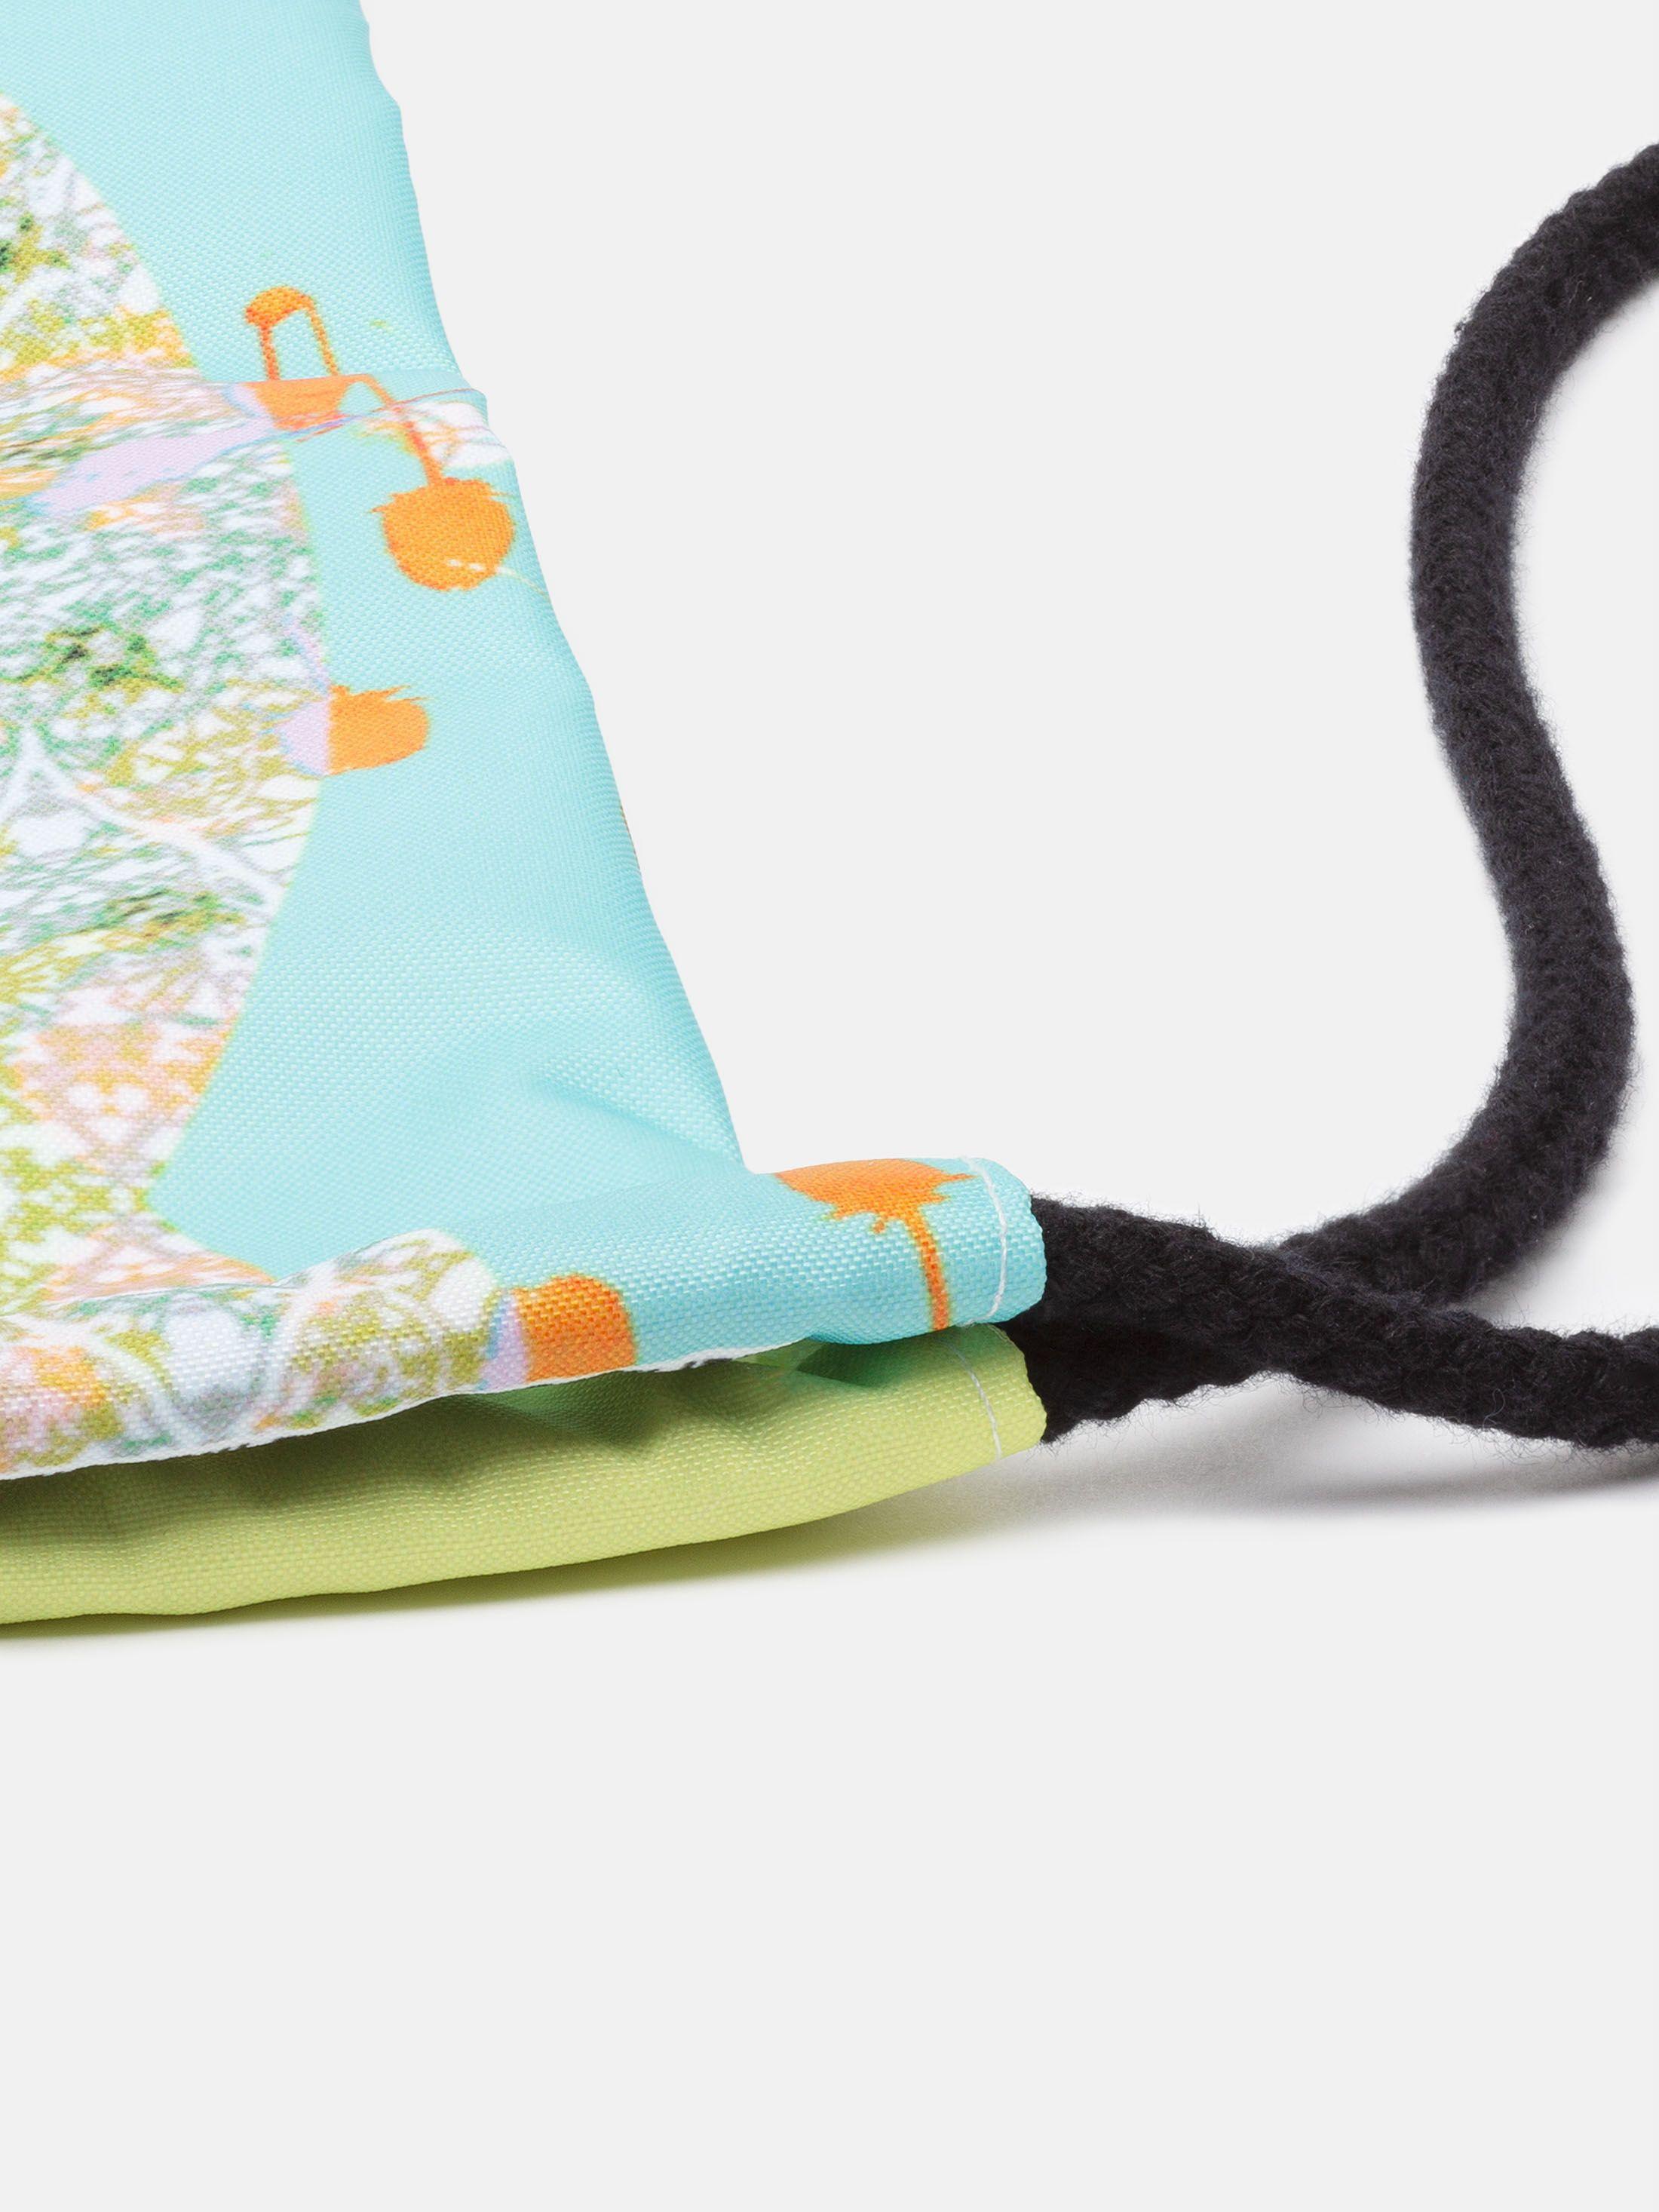 custom cinch sacks with pink floral artwork